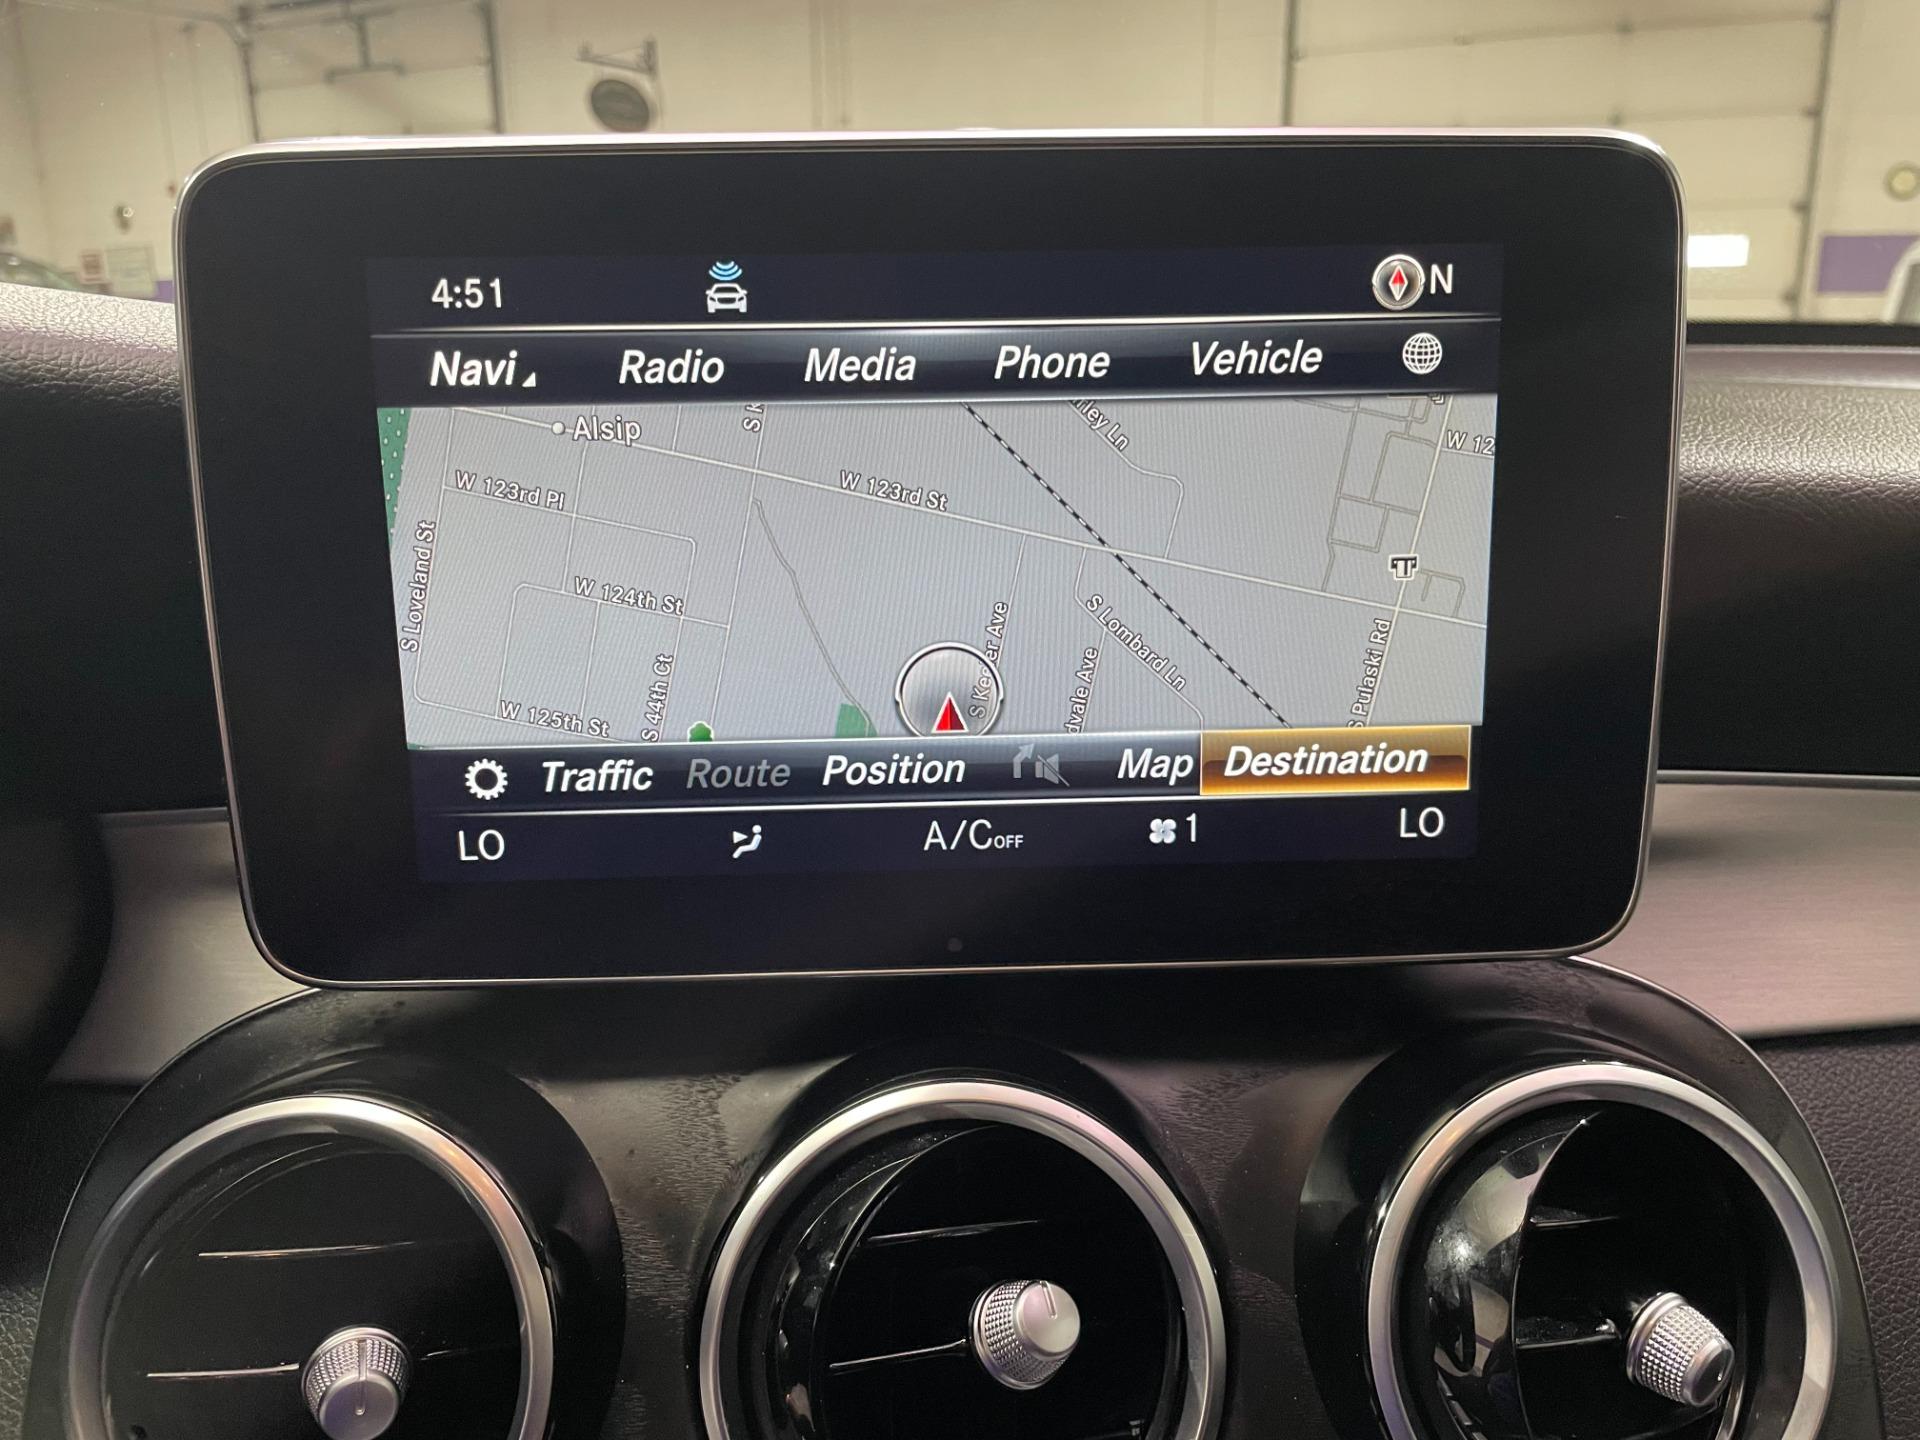 Used-2019-Mercedes-Benz-GLC-coupe-GLC-300-4MATIC